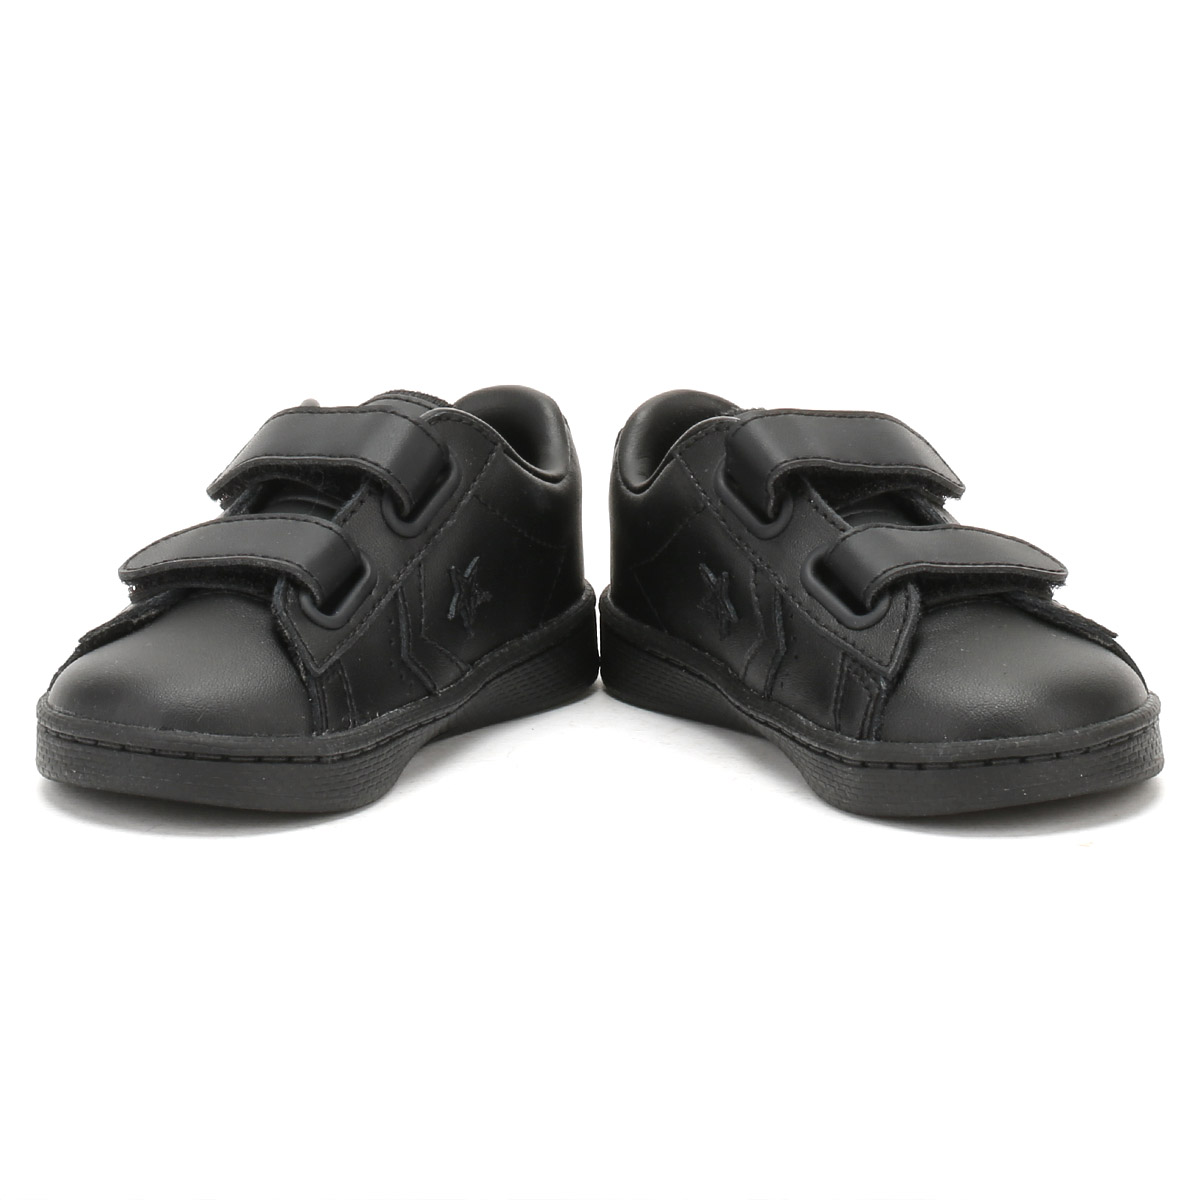 0e1ac6739edd6 Converse Infants Black PL  76 2v Ox Trainers Size 6 - 10 UK 7 Infant ...